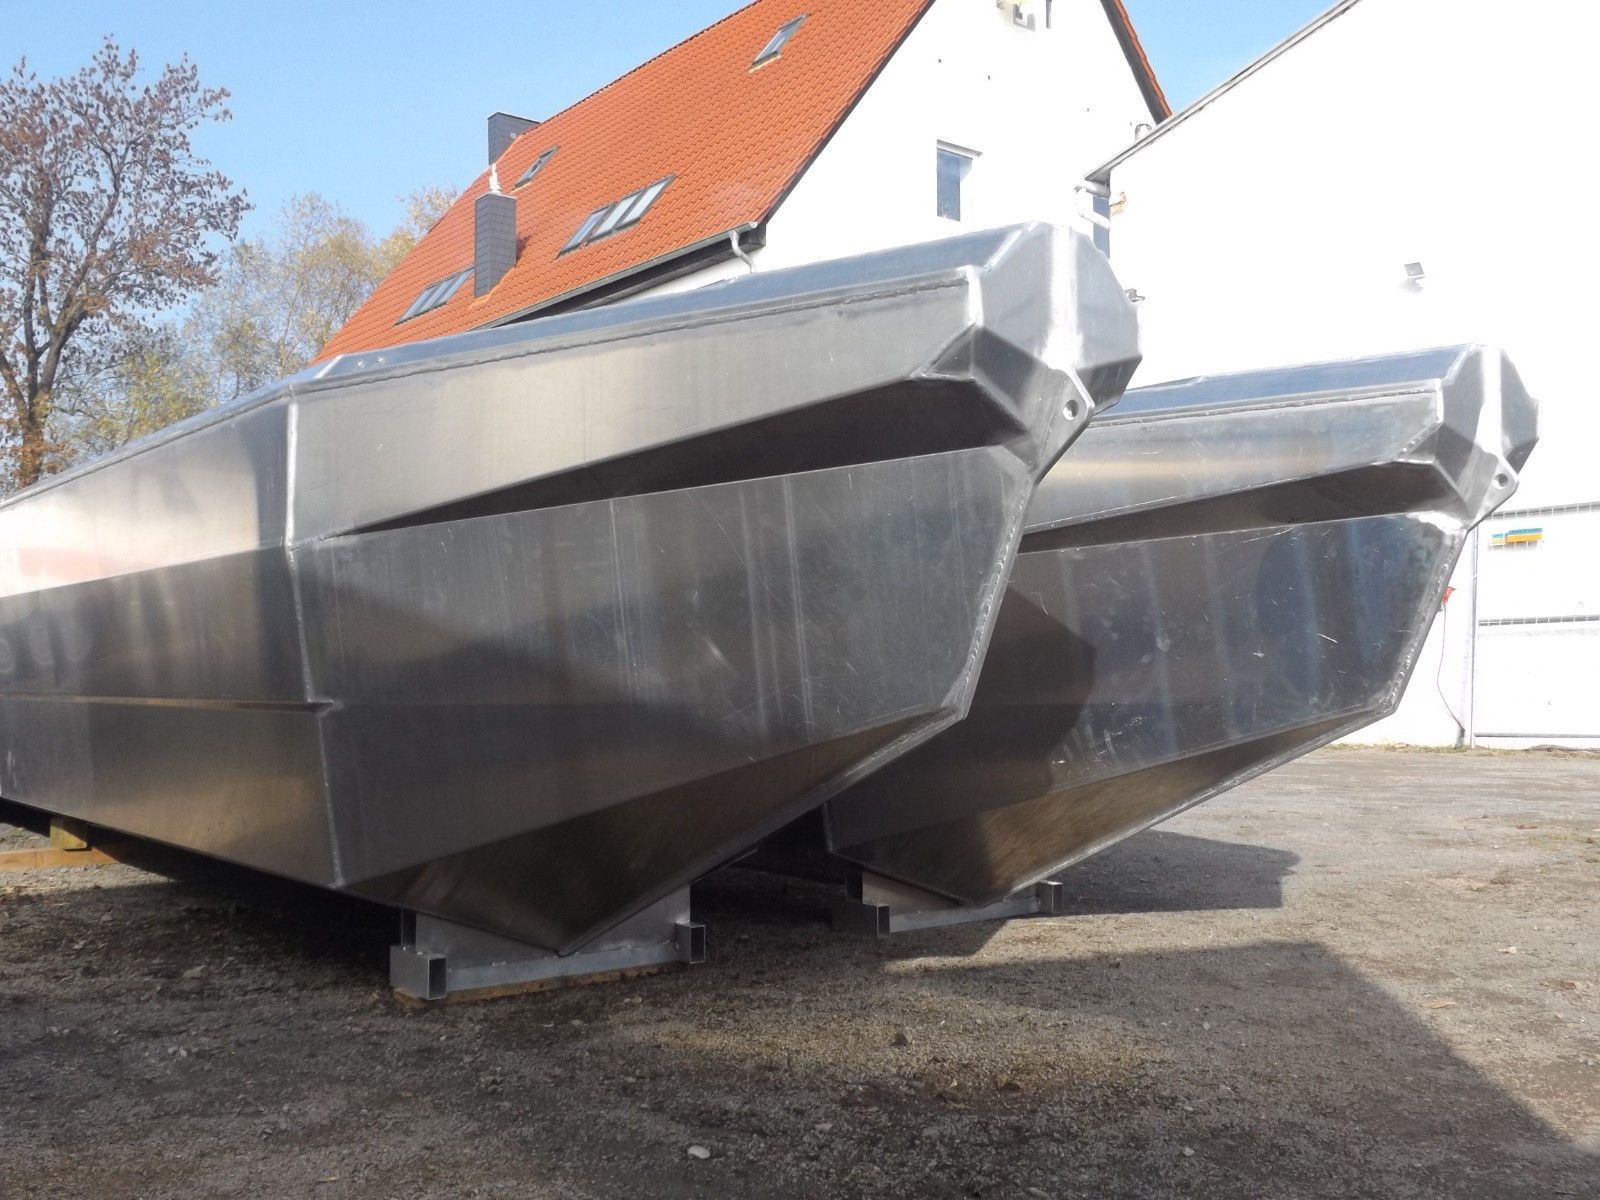 hausboot aluminium motorkatamaran pontonboot partyfloss. Black Bedroom Furniture Sets. Home Design Ideas